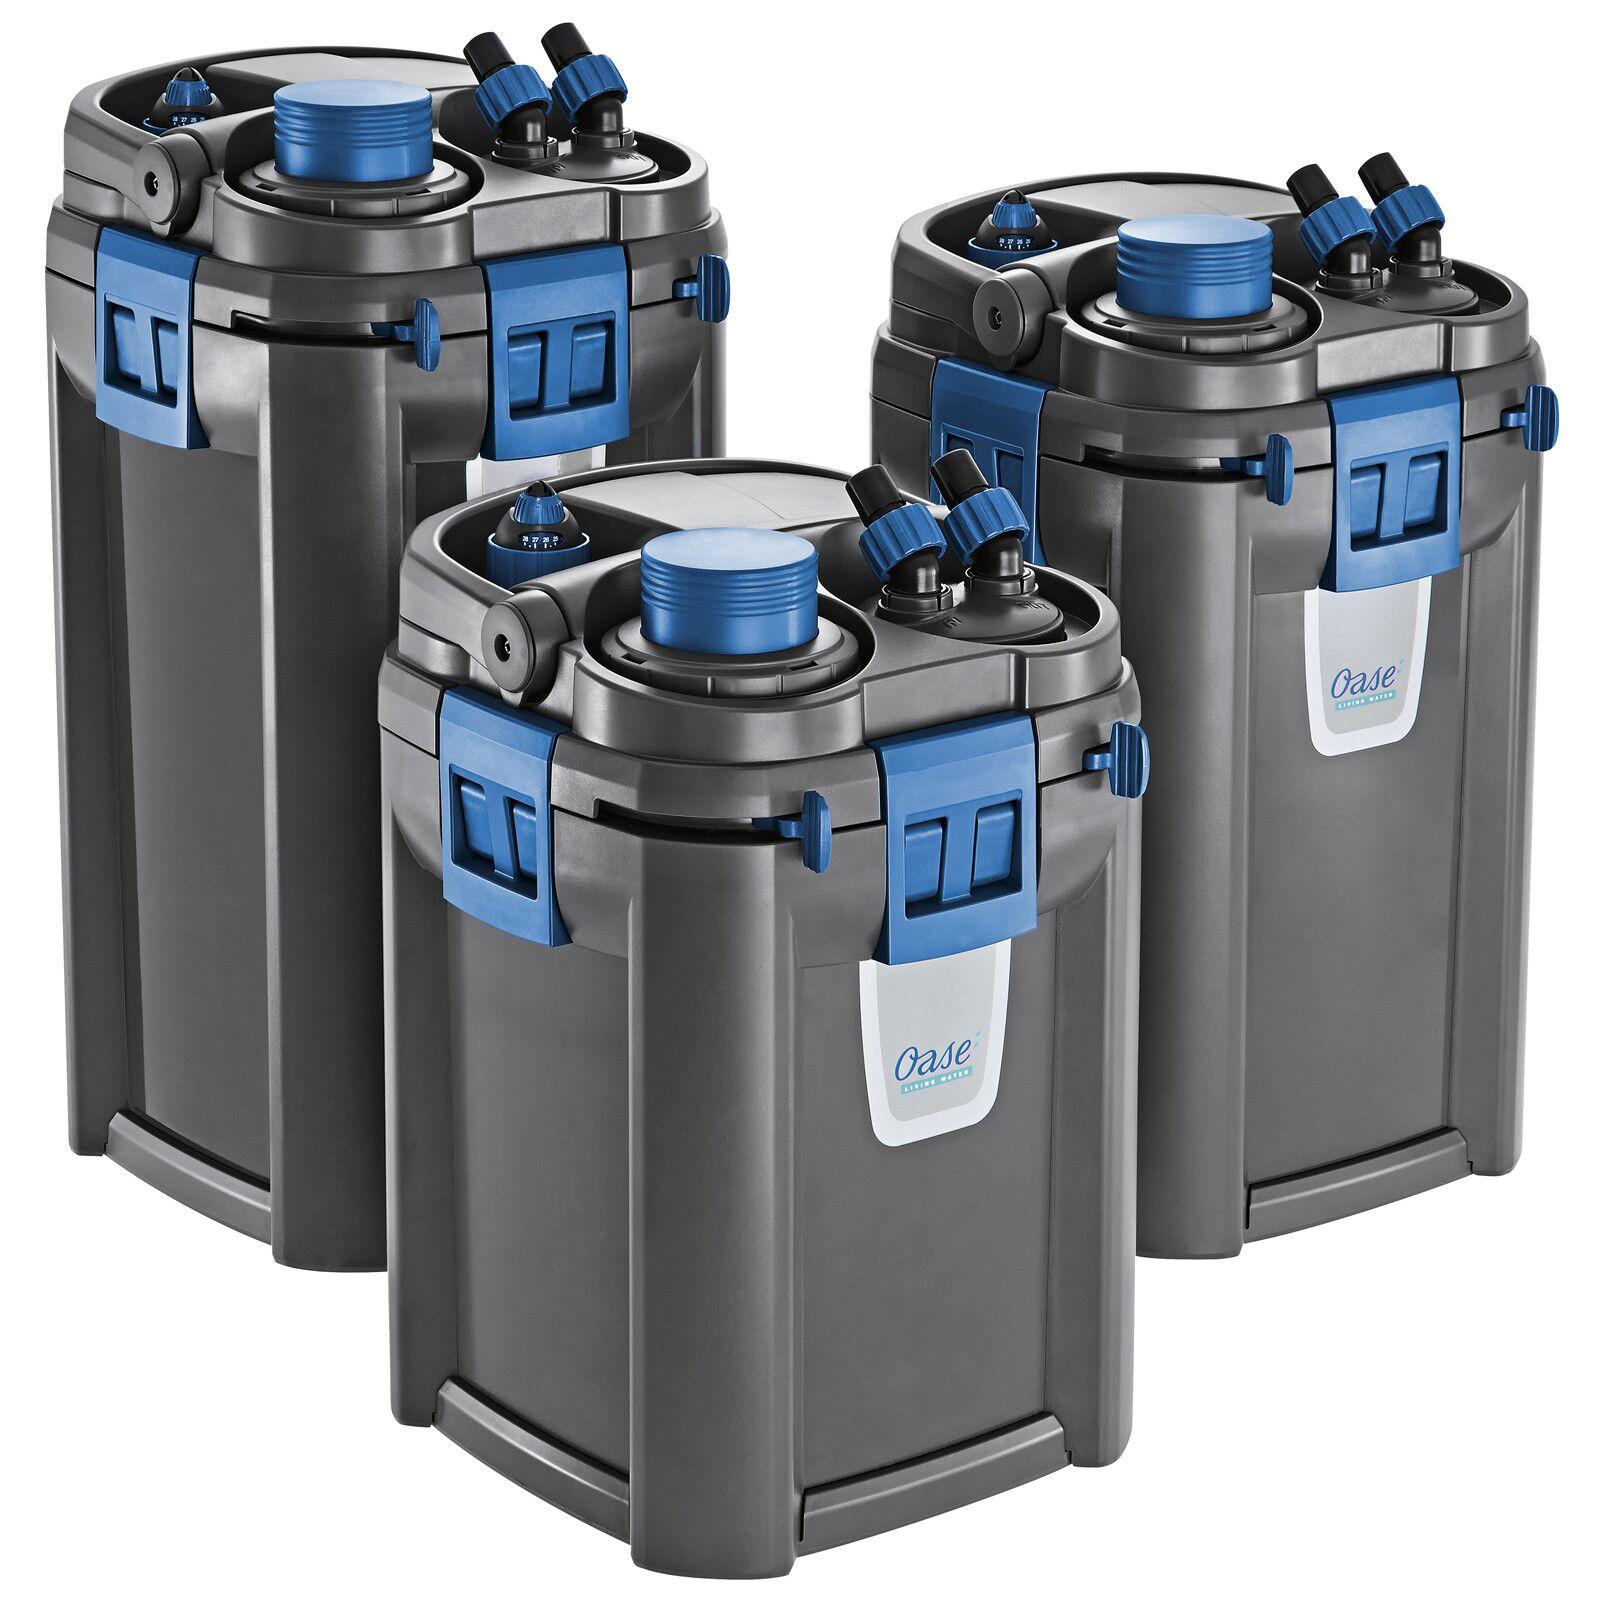 Oase - BioMaster - Thermo - 600 | Aquasabi - Aquascaping Shop